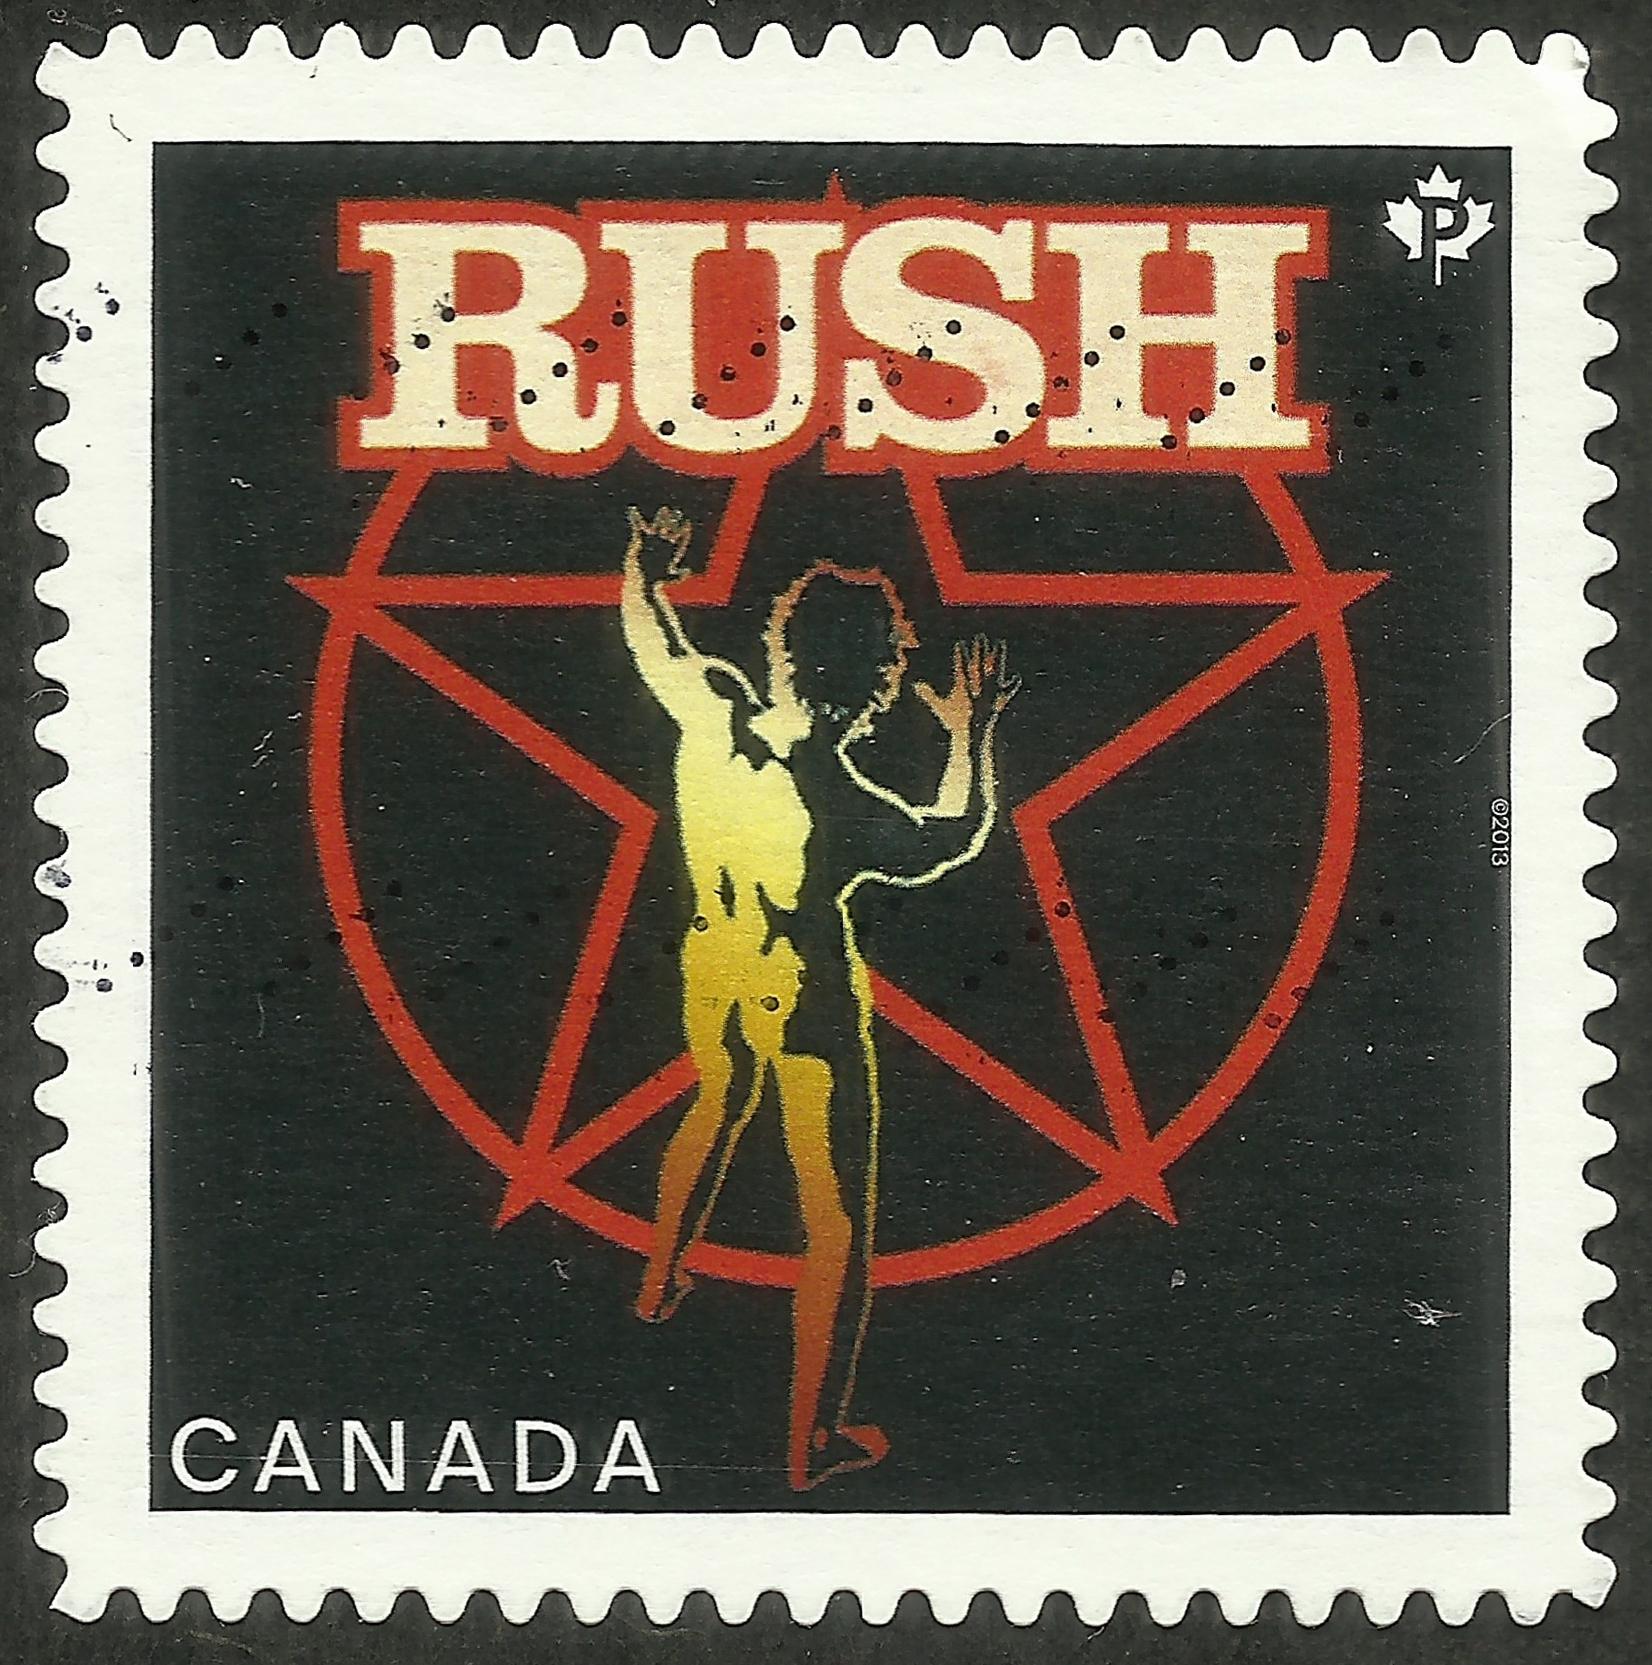 Canada - Scott #2657 (2013)